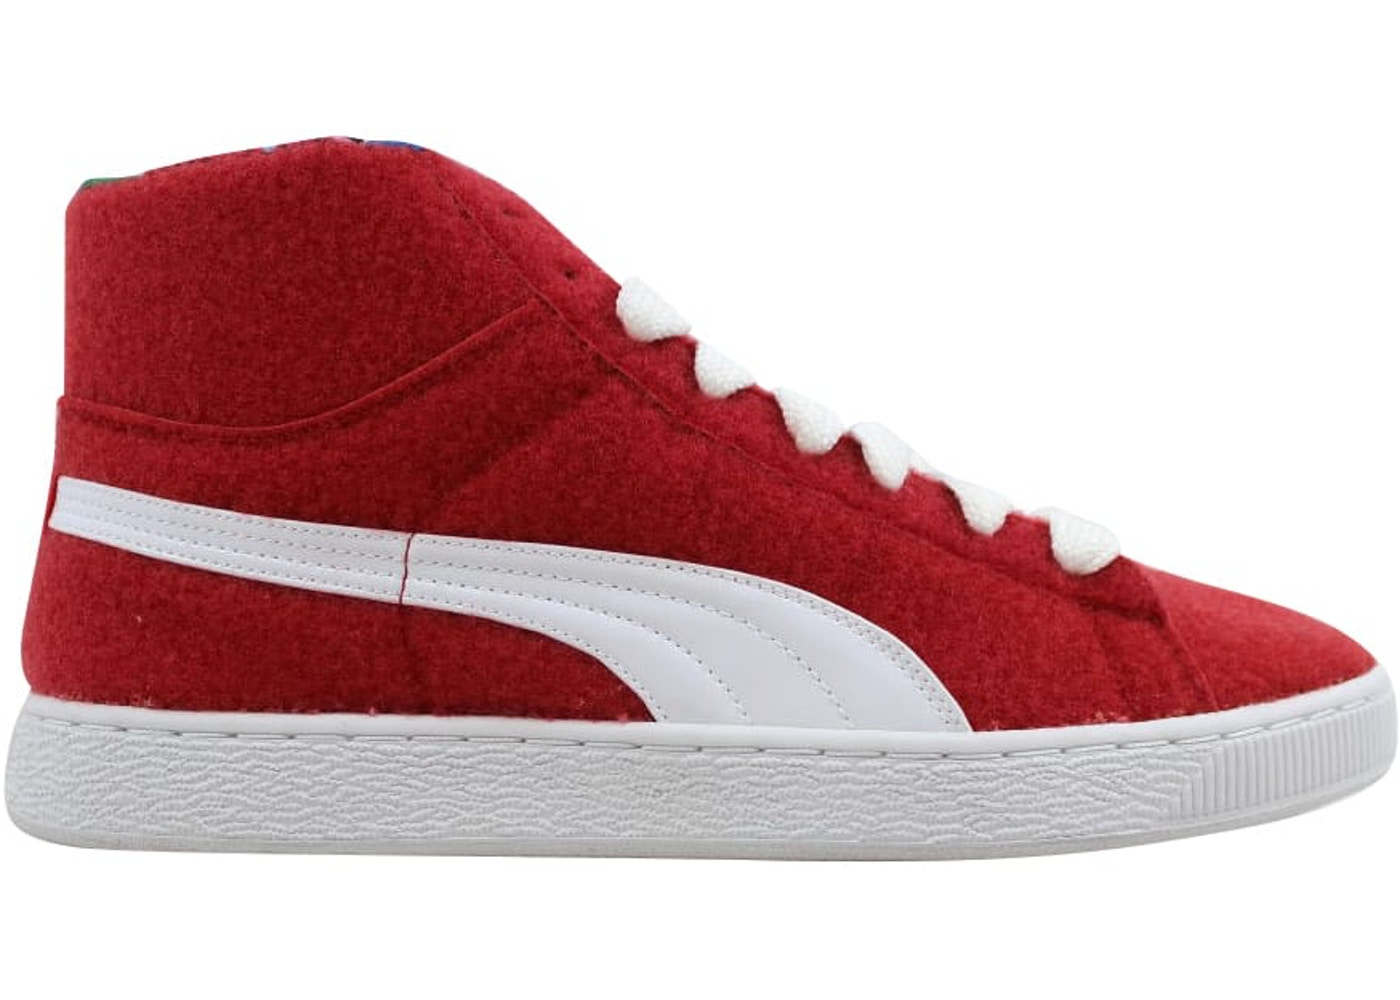 newest collection c6f95 0dbc9 Puma Basket Mid X Dee & Rickey CR Ribbon Red/White - 360085-01